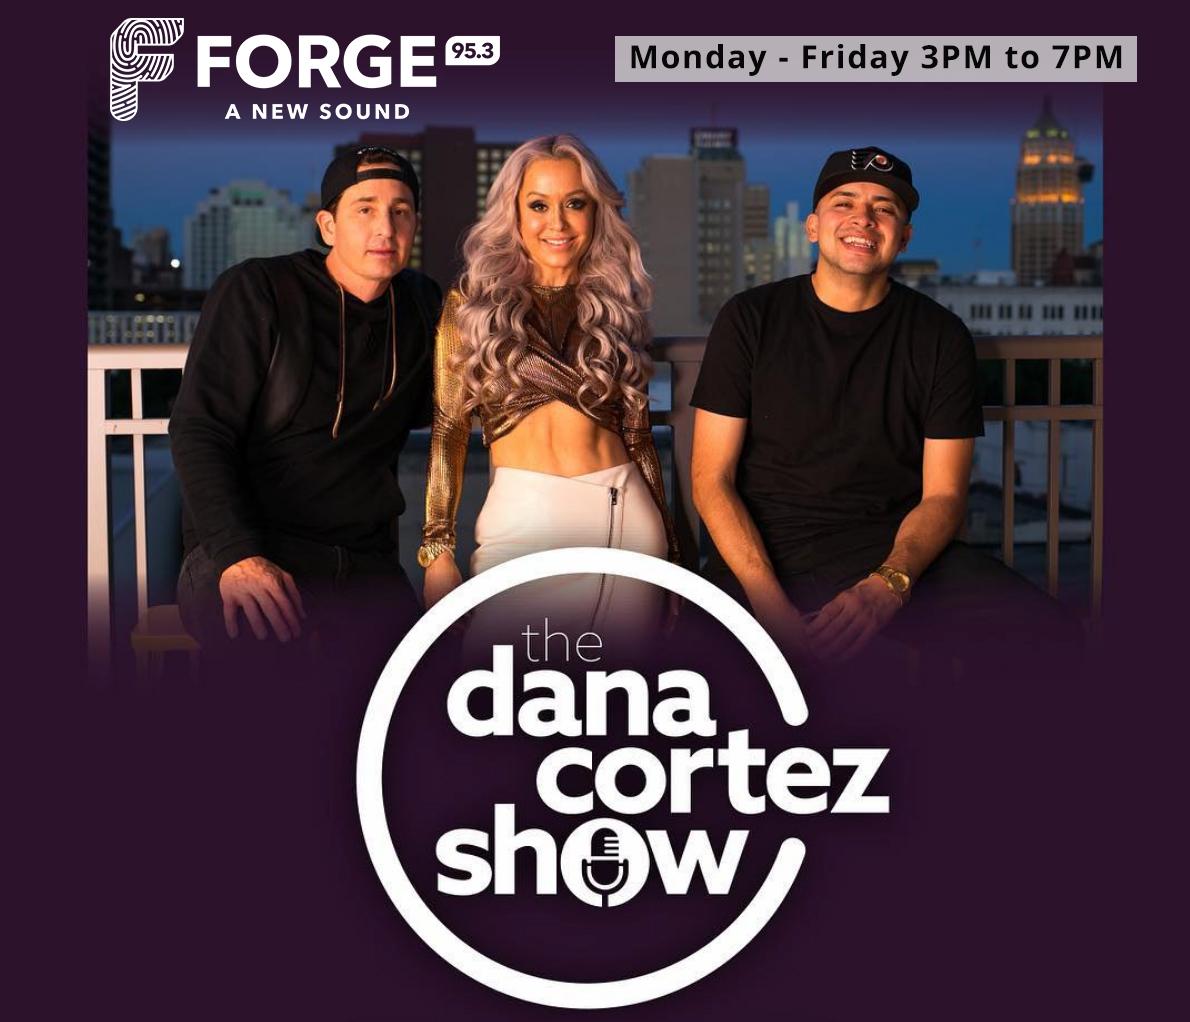 Fresno's BEST drivetime show is The Dana Cortez Show, Monday - Friday, 3pm to 7pm only on Forge 103.9! 😎 #thedanacortezshow #forge953 #fresnoradio #latinasinradio #womeninradio #danacortez #drivetime #fresnolife